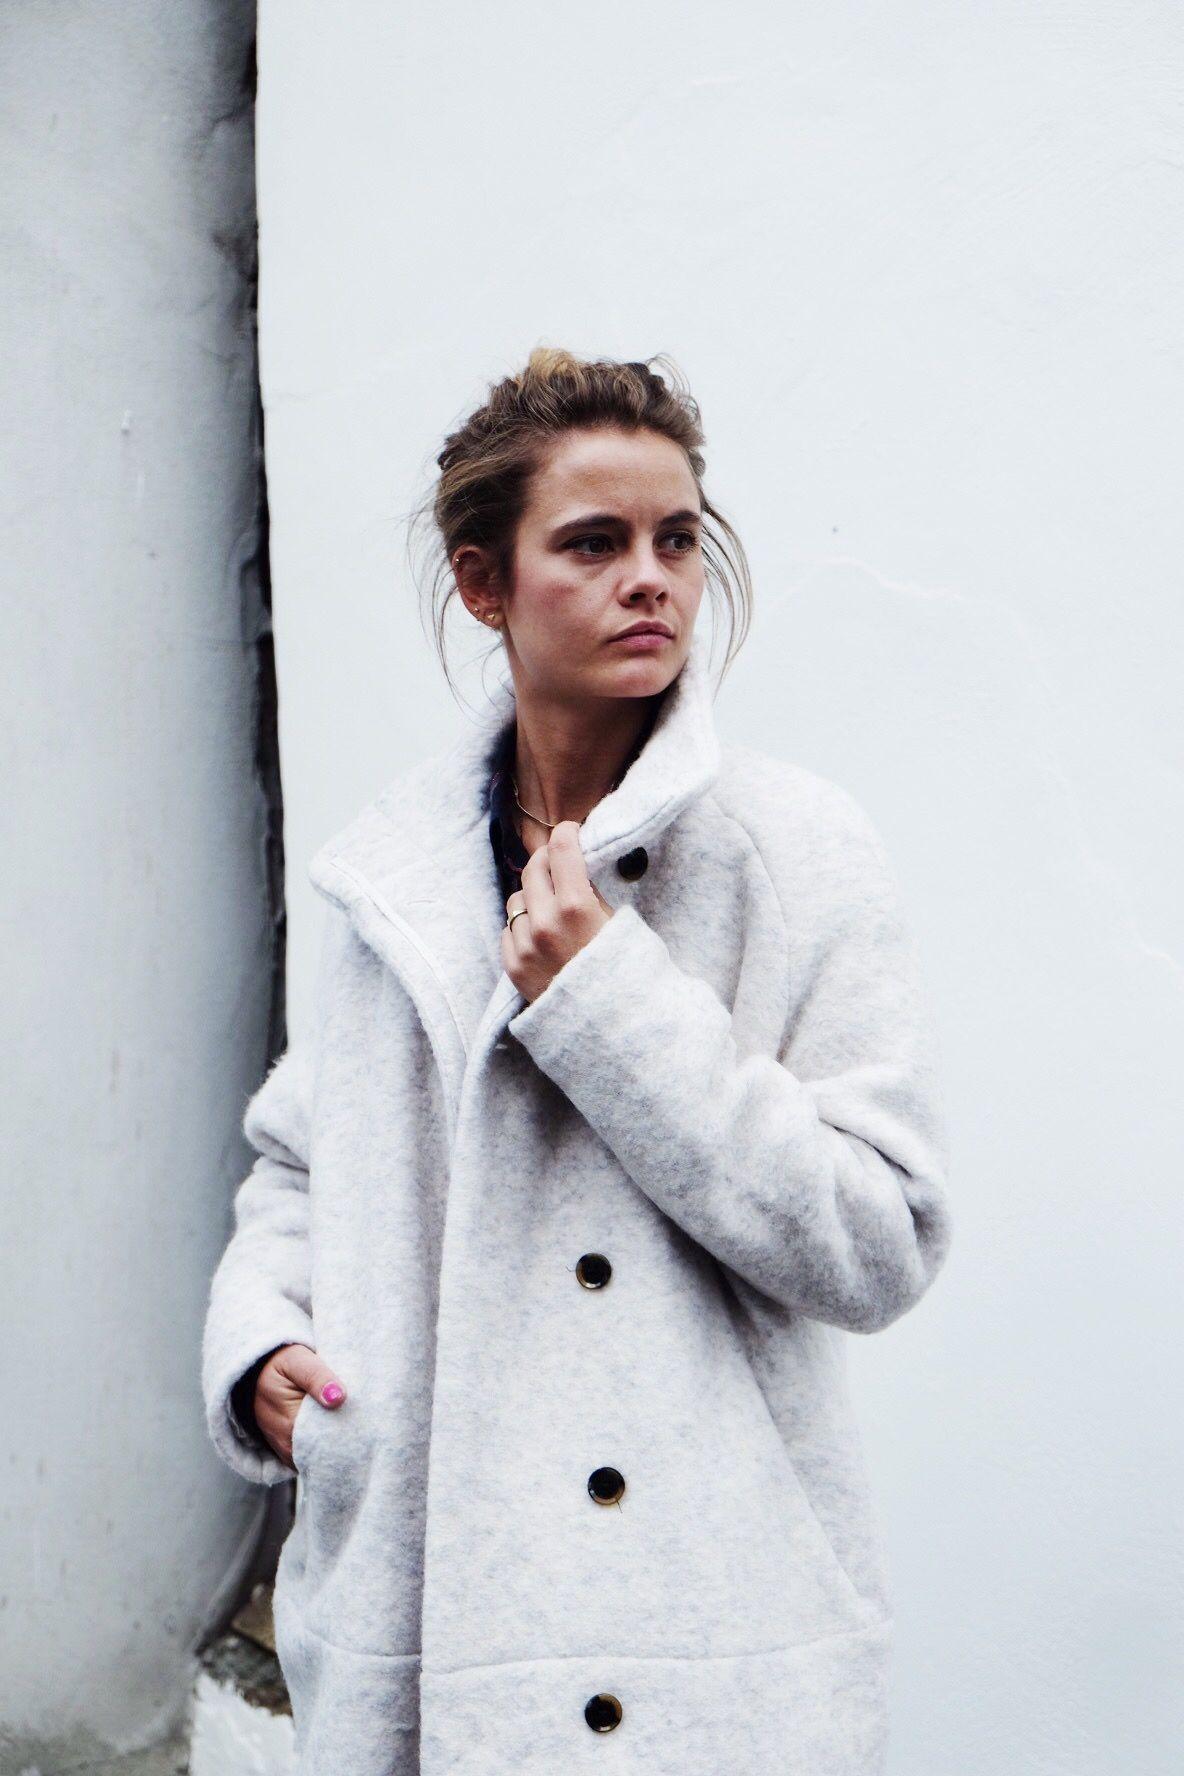 The oh so talented Stefanie wearing the oh so stylish Samsoe Samsoe Hoff  jacket. Get